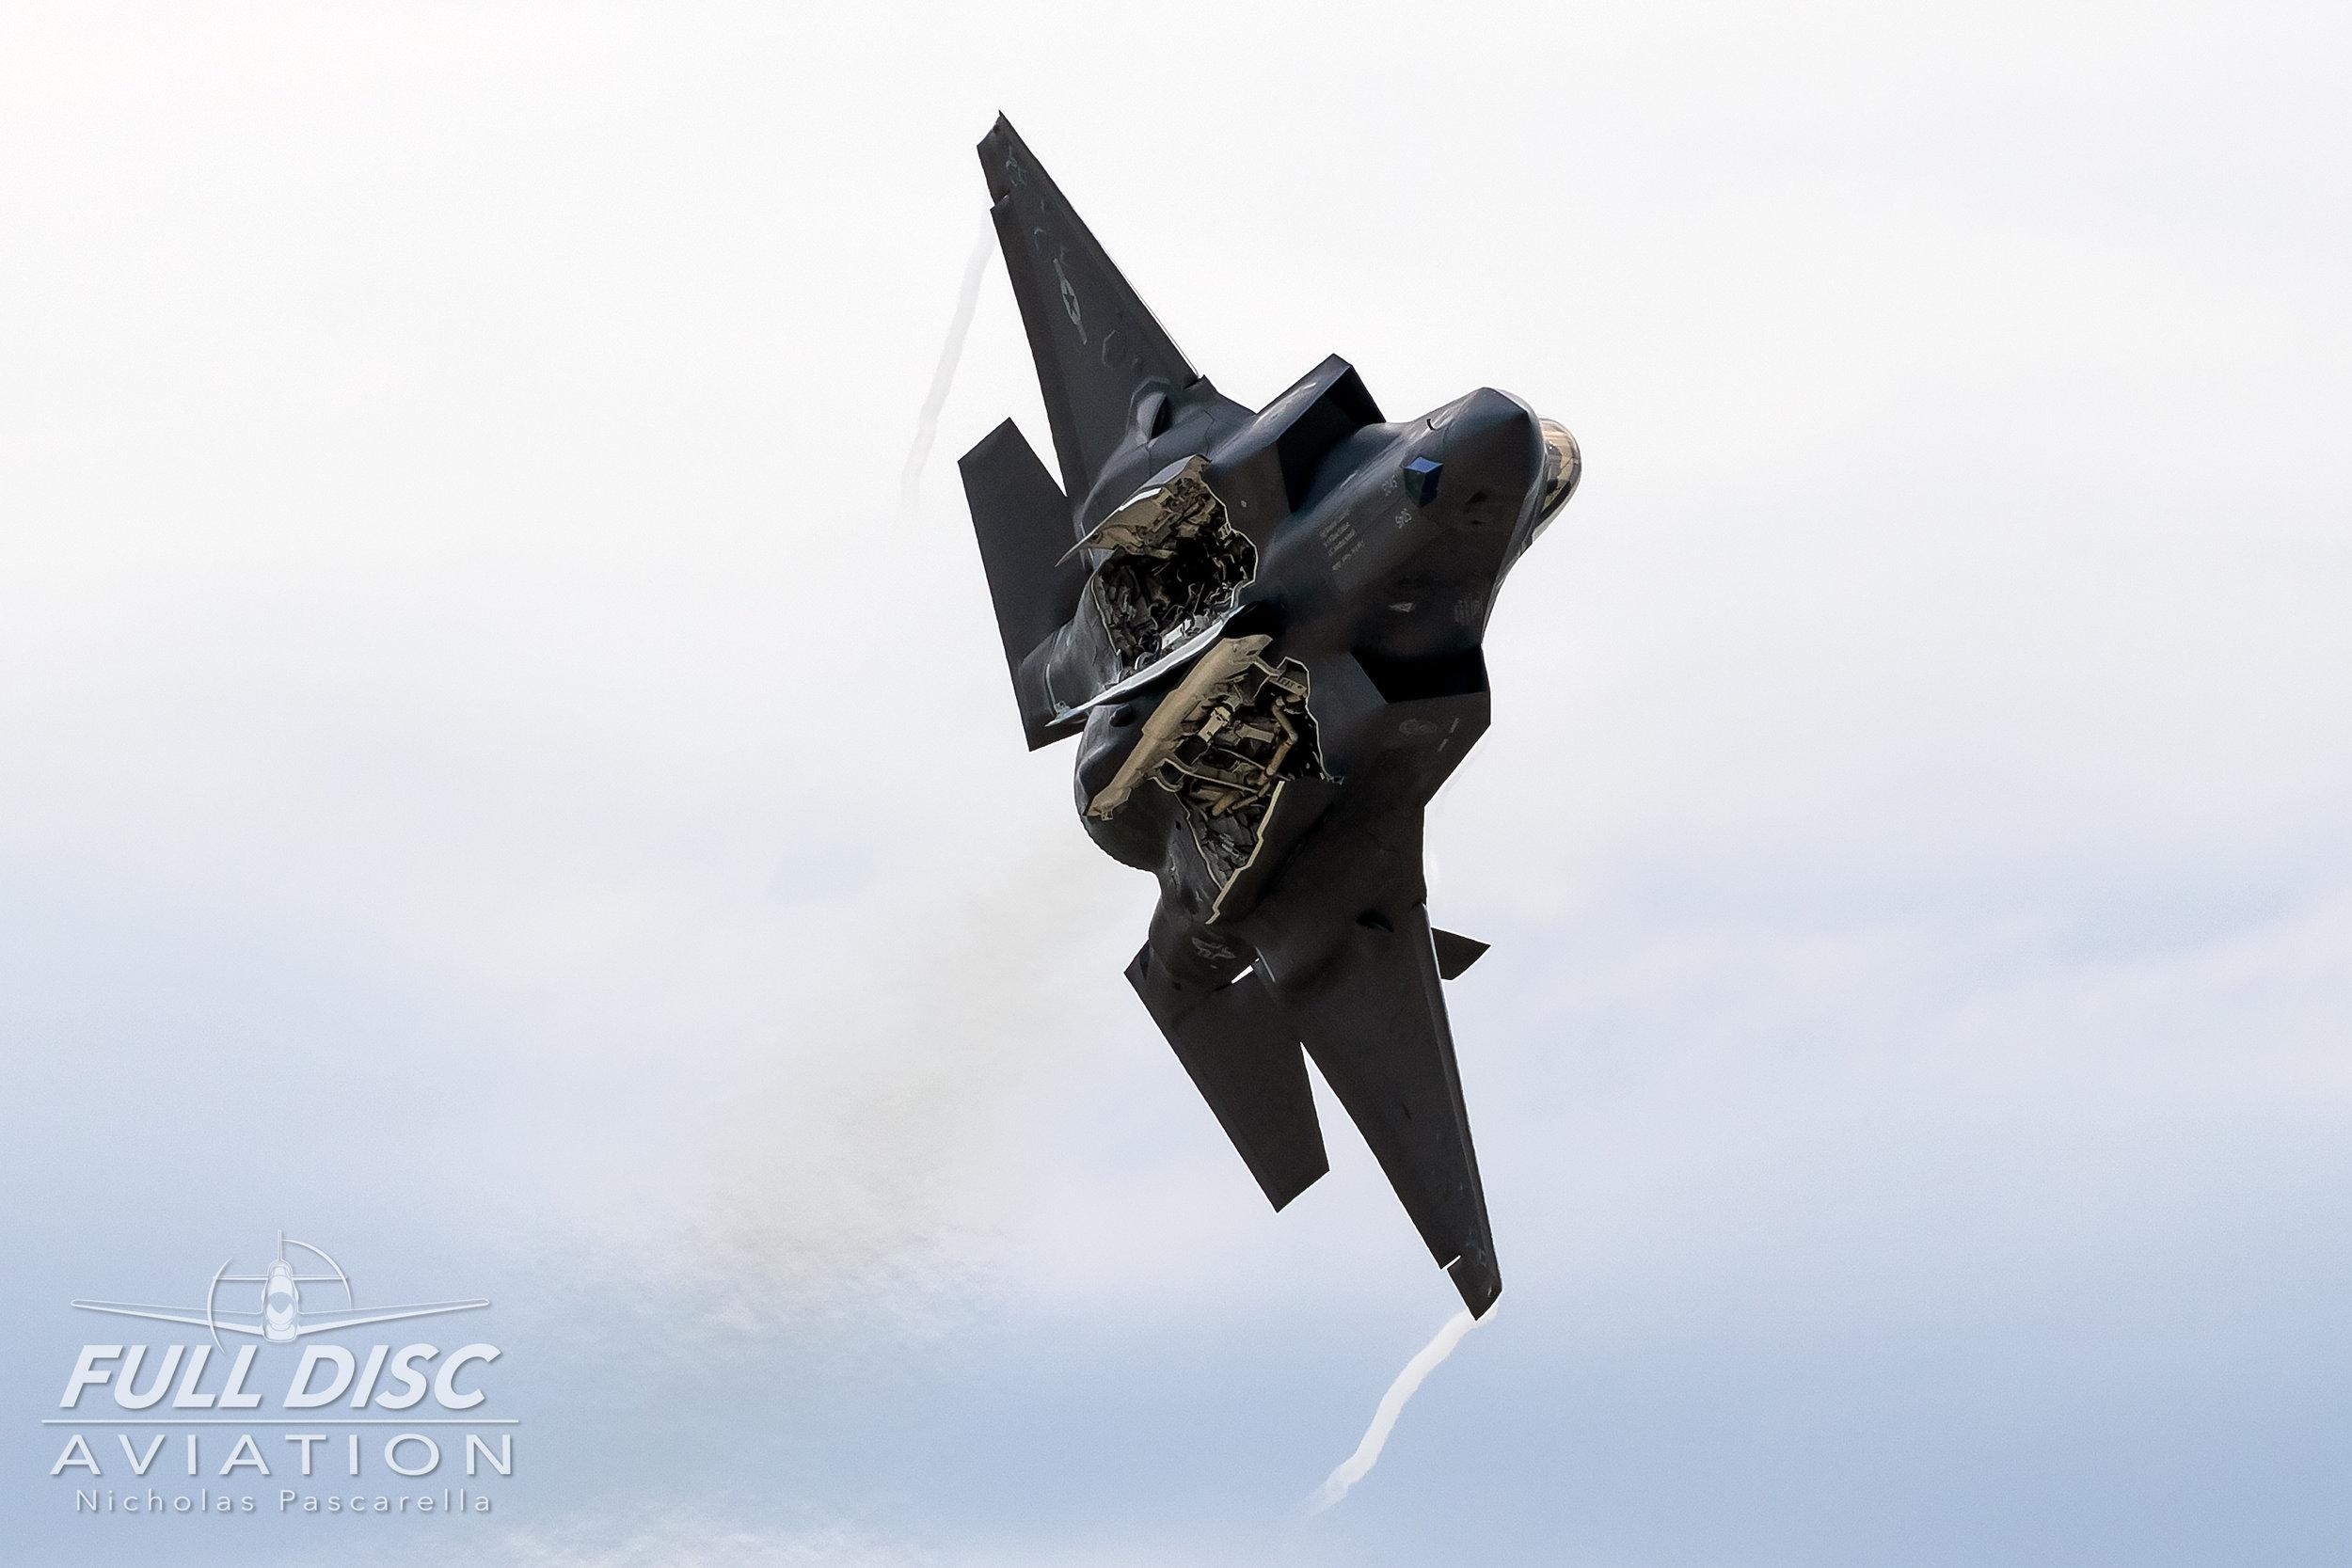 f35_weaponsbay_wingsoverwayne_nickpascarella_fulldiscaviation.jpg